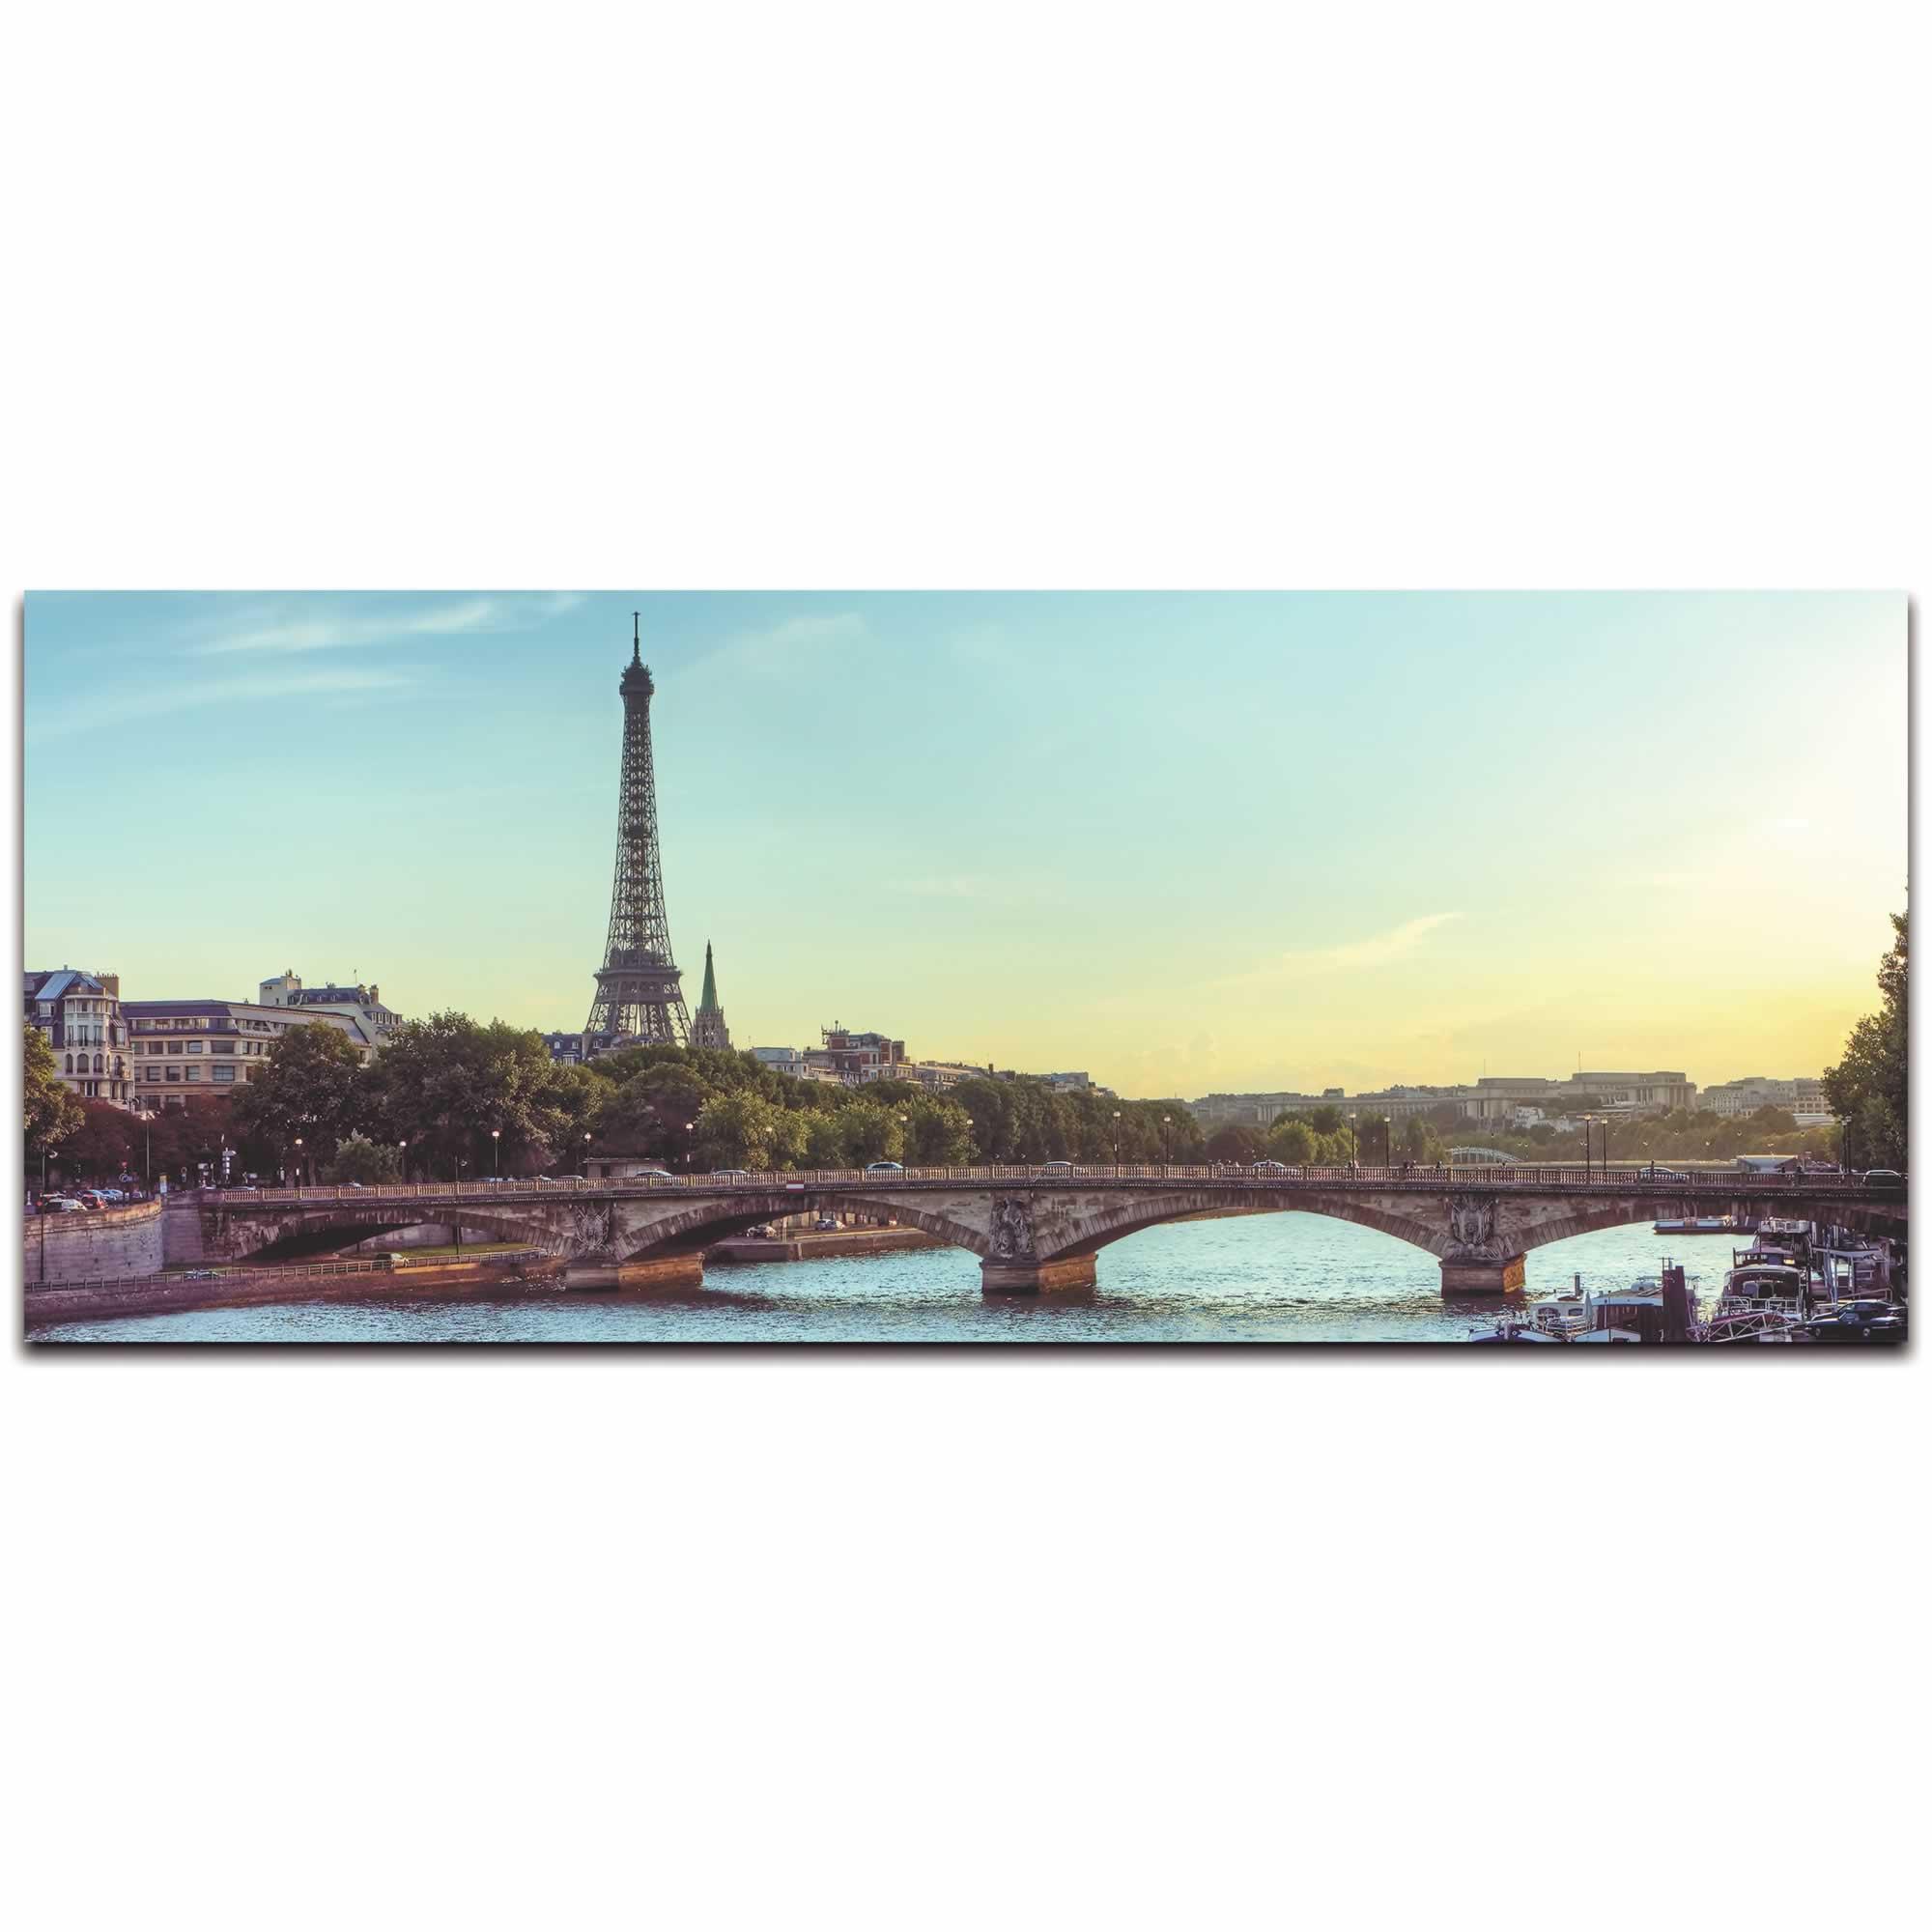 Classic Paris City Skyline - Urban Modern Art, Designer Home Decor, Cityscape Wall Artwork, Trendy Contemporary Art - Alternate View 2